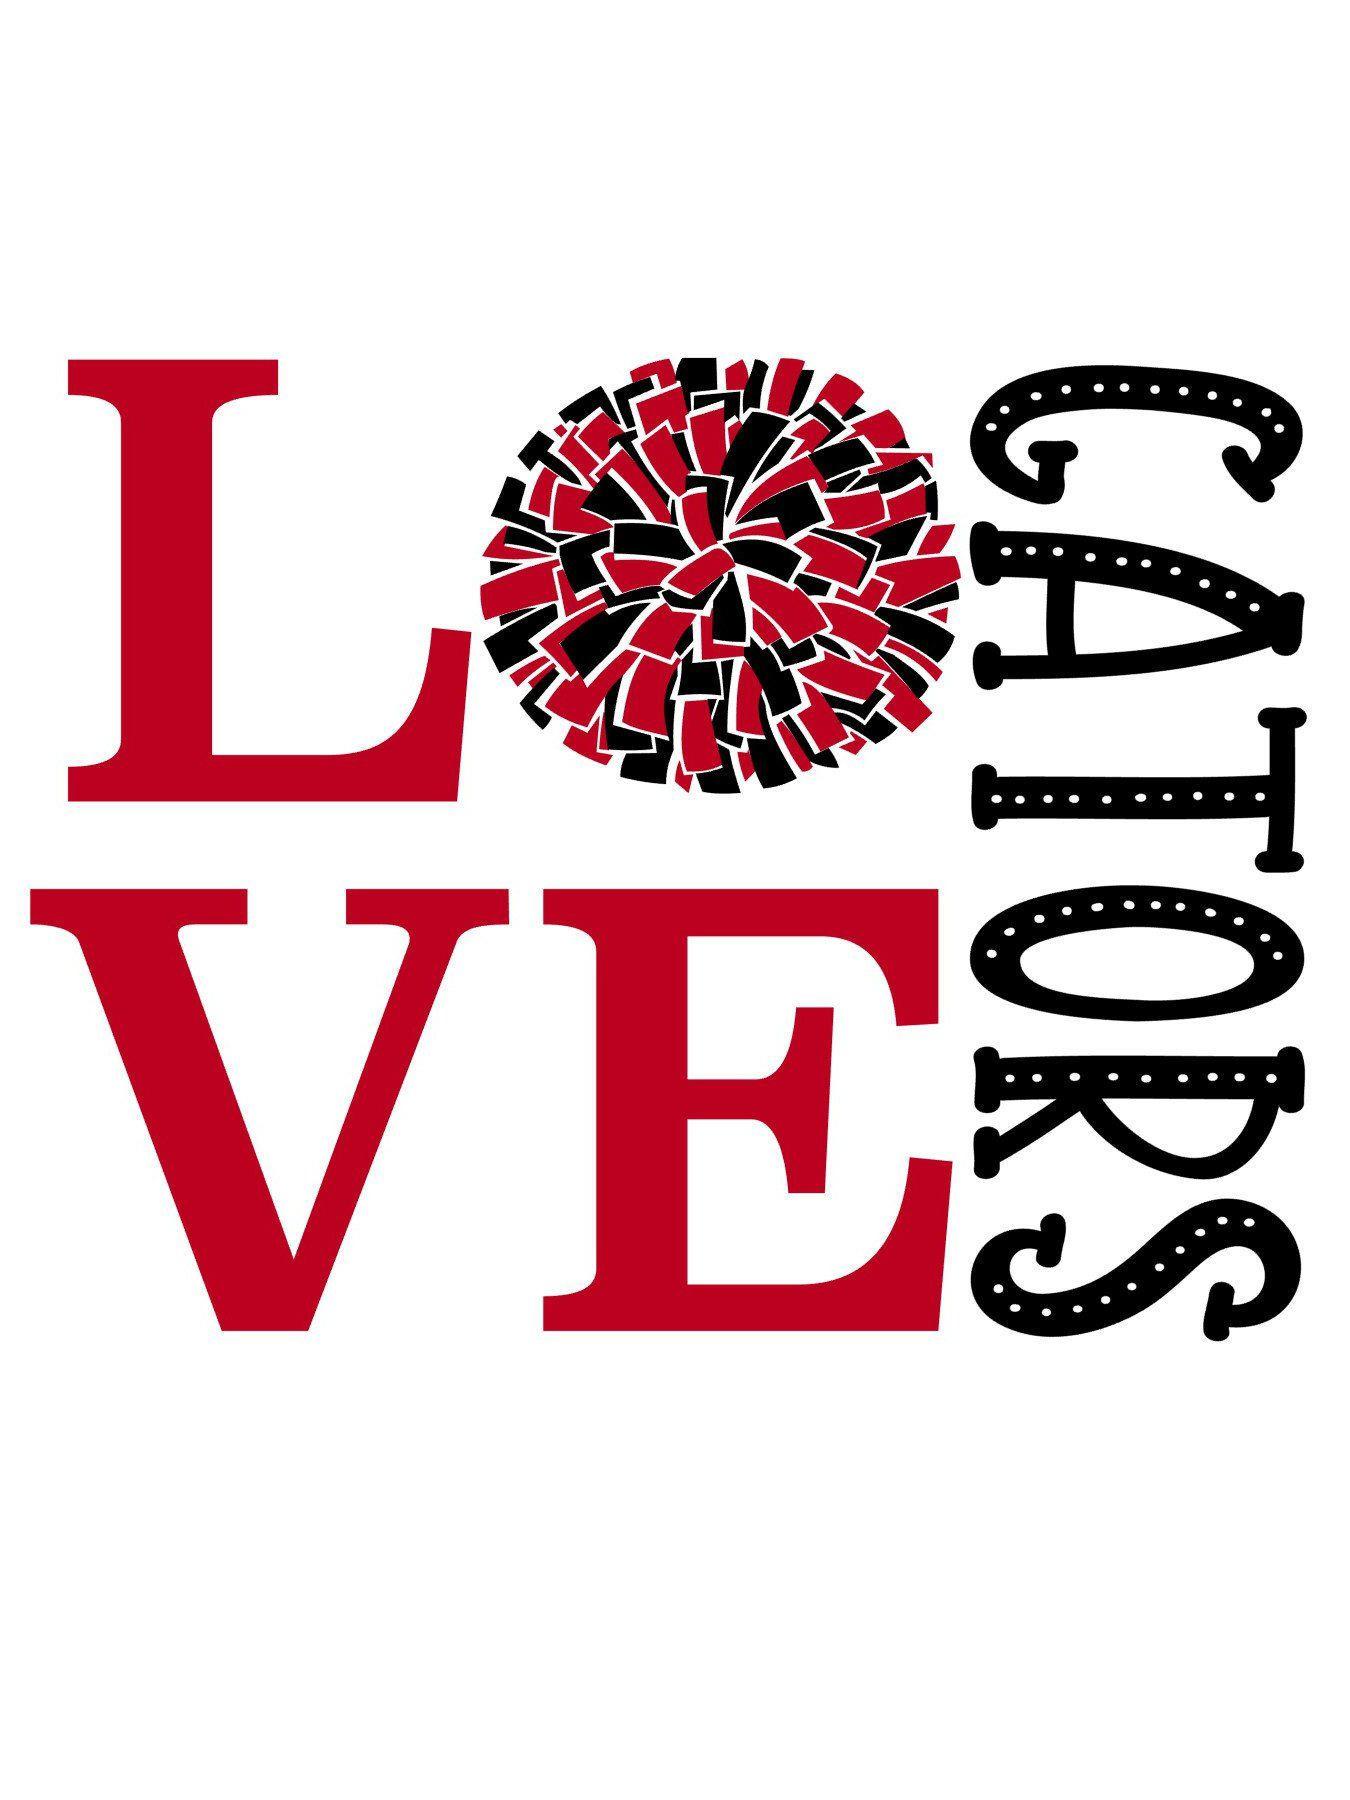 Download Love Gators Cheer SVG | Cheer, Team names, Etsy